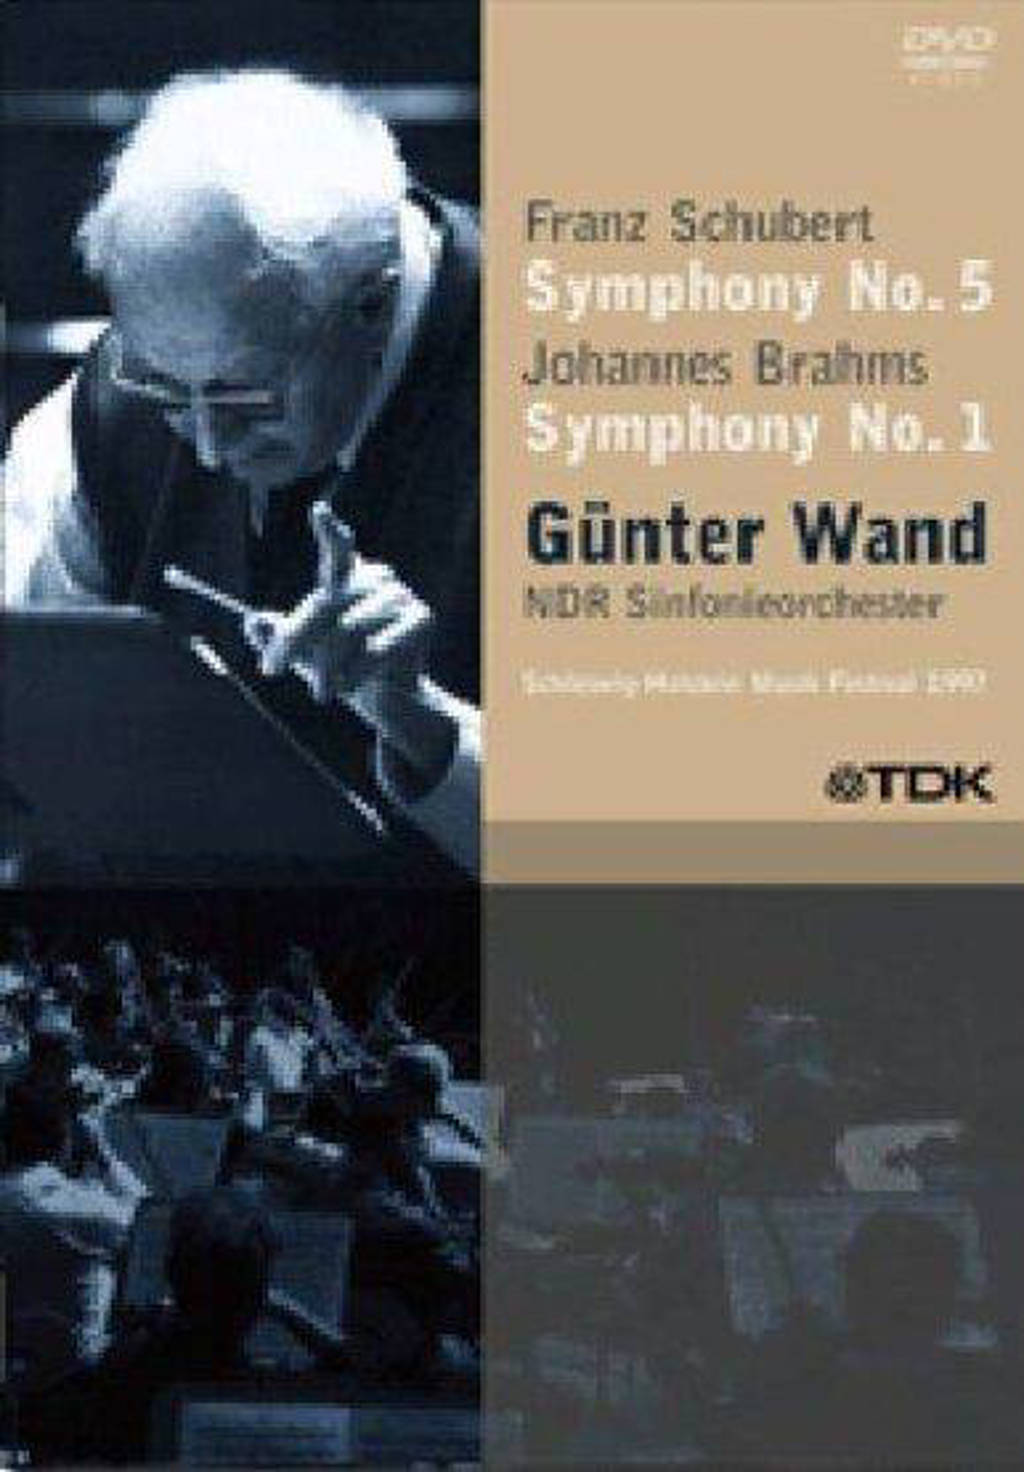 Ndr Sinfonieorchester - Gunter Wand Vol 7 (DVD)